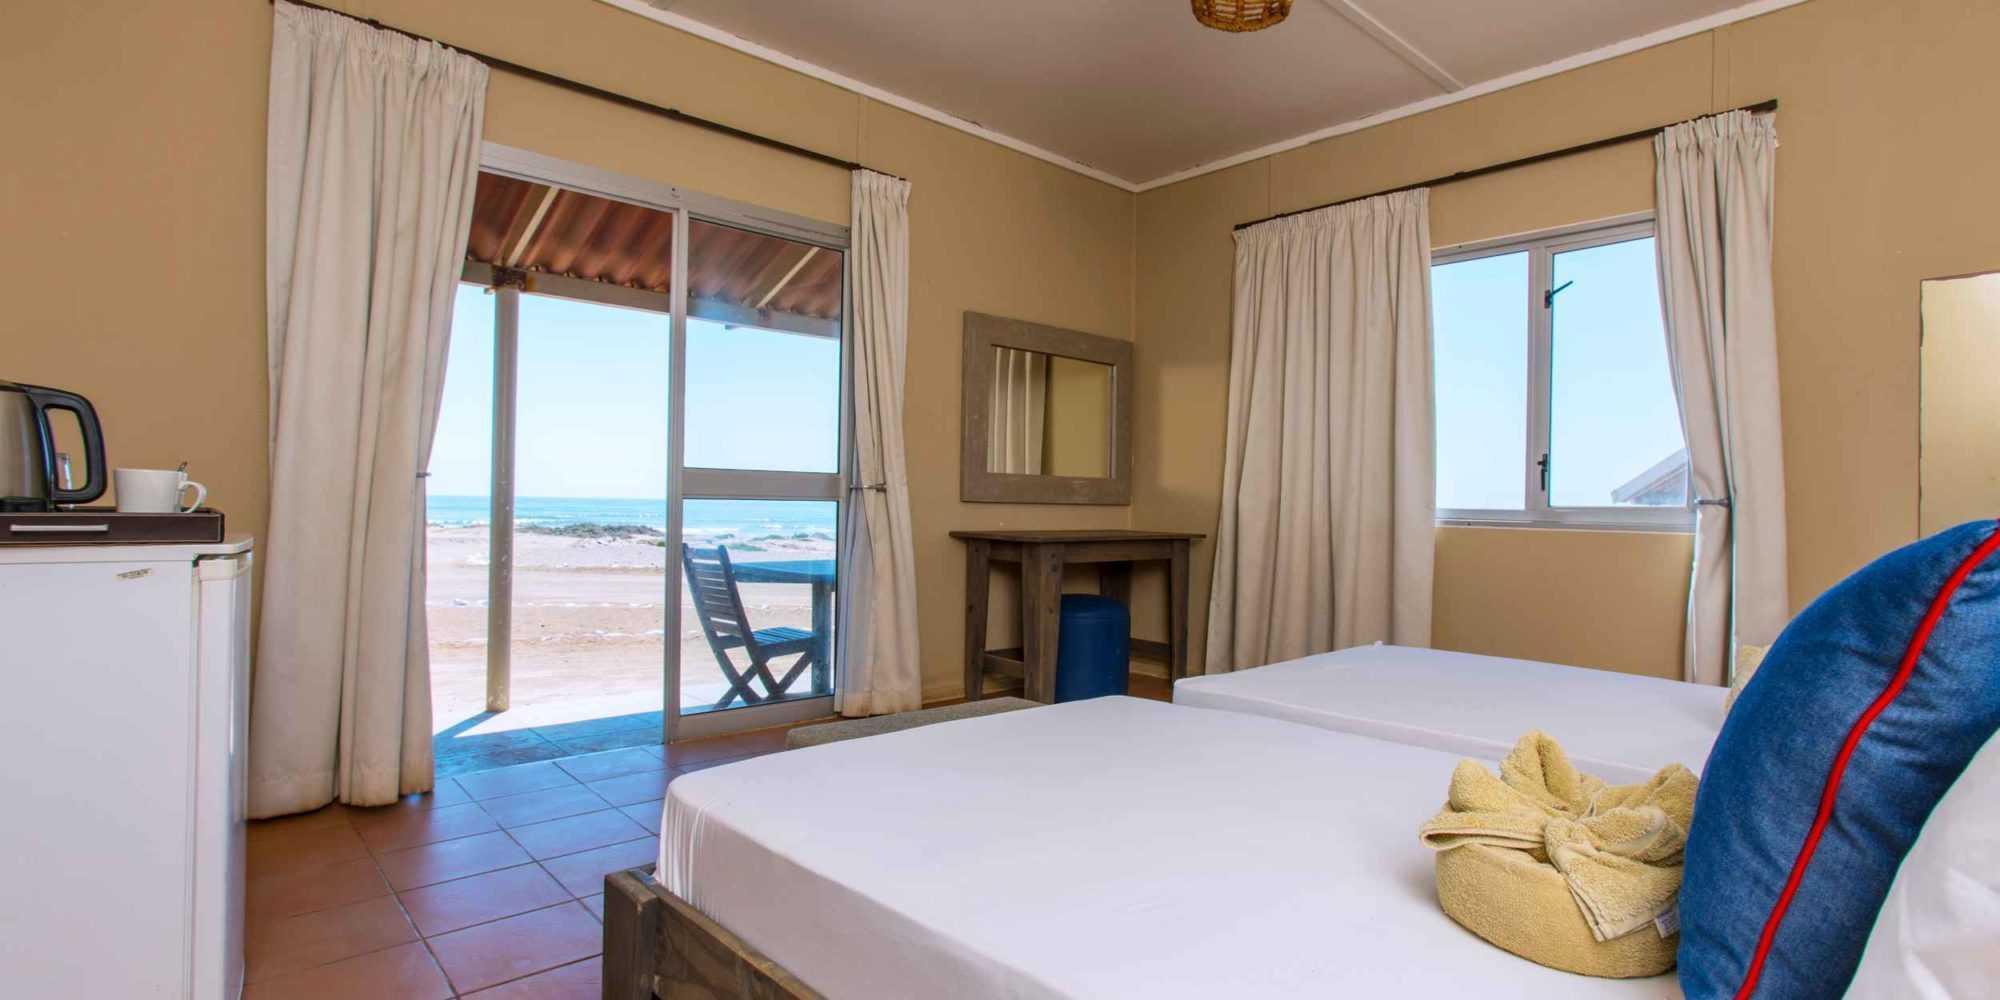 Terrace Bay Double Room 02 © NWR 2018